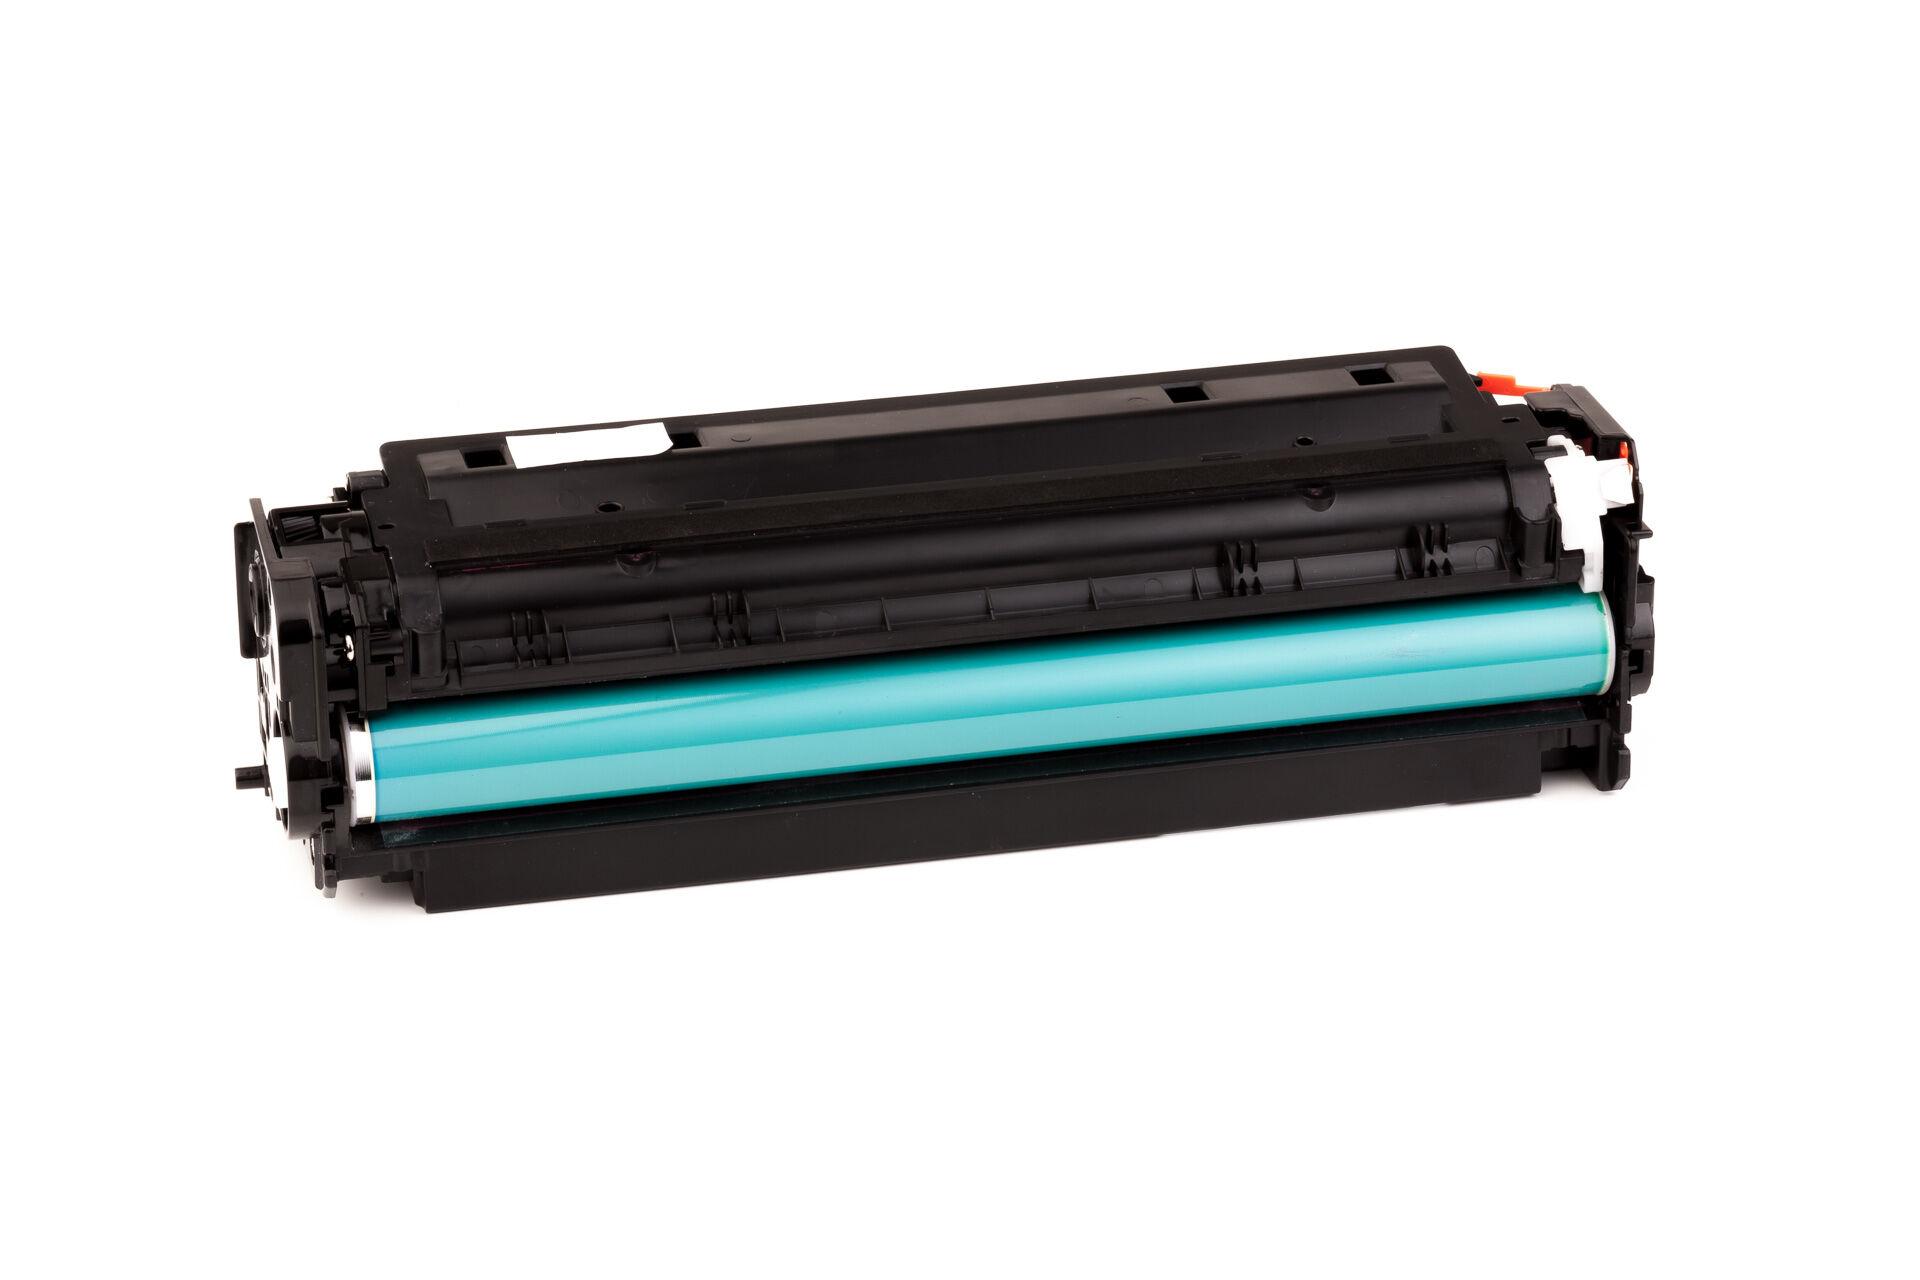 HP Cartouche de Toner pour HP CE413A / 305A magenta compatible (de marque ASC)